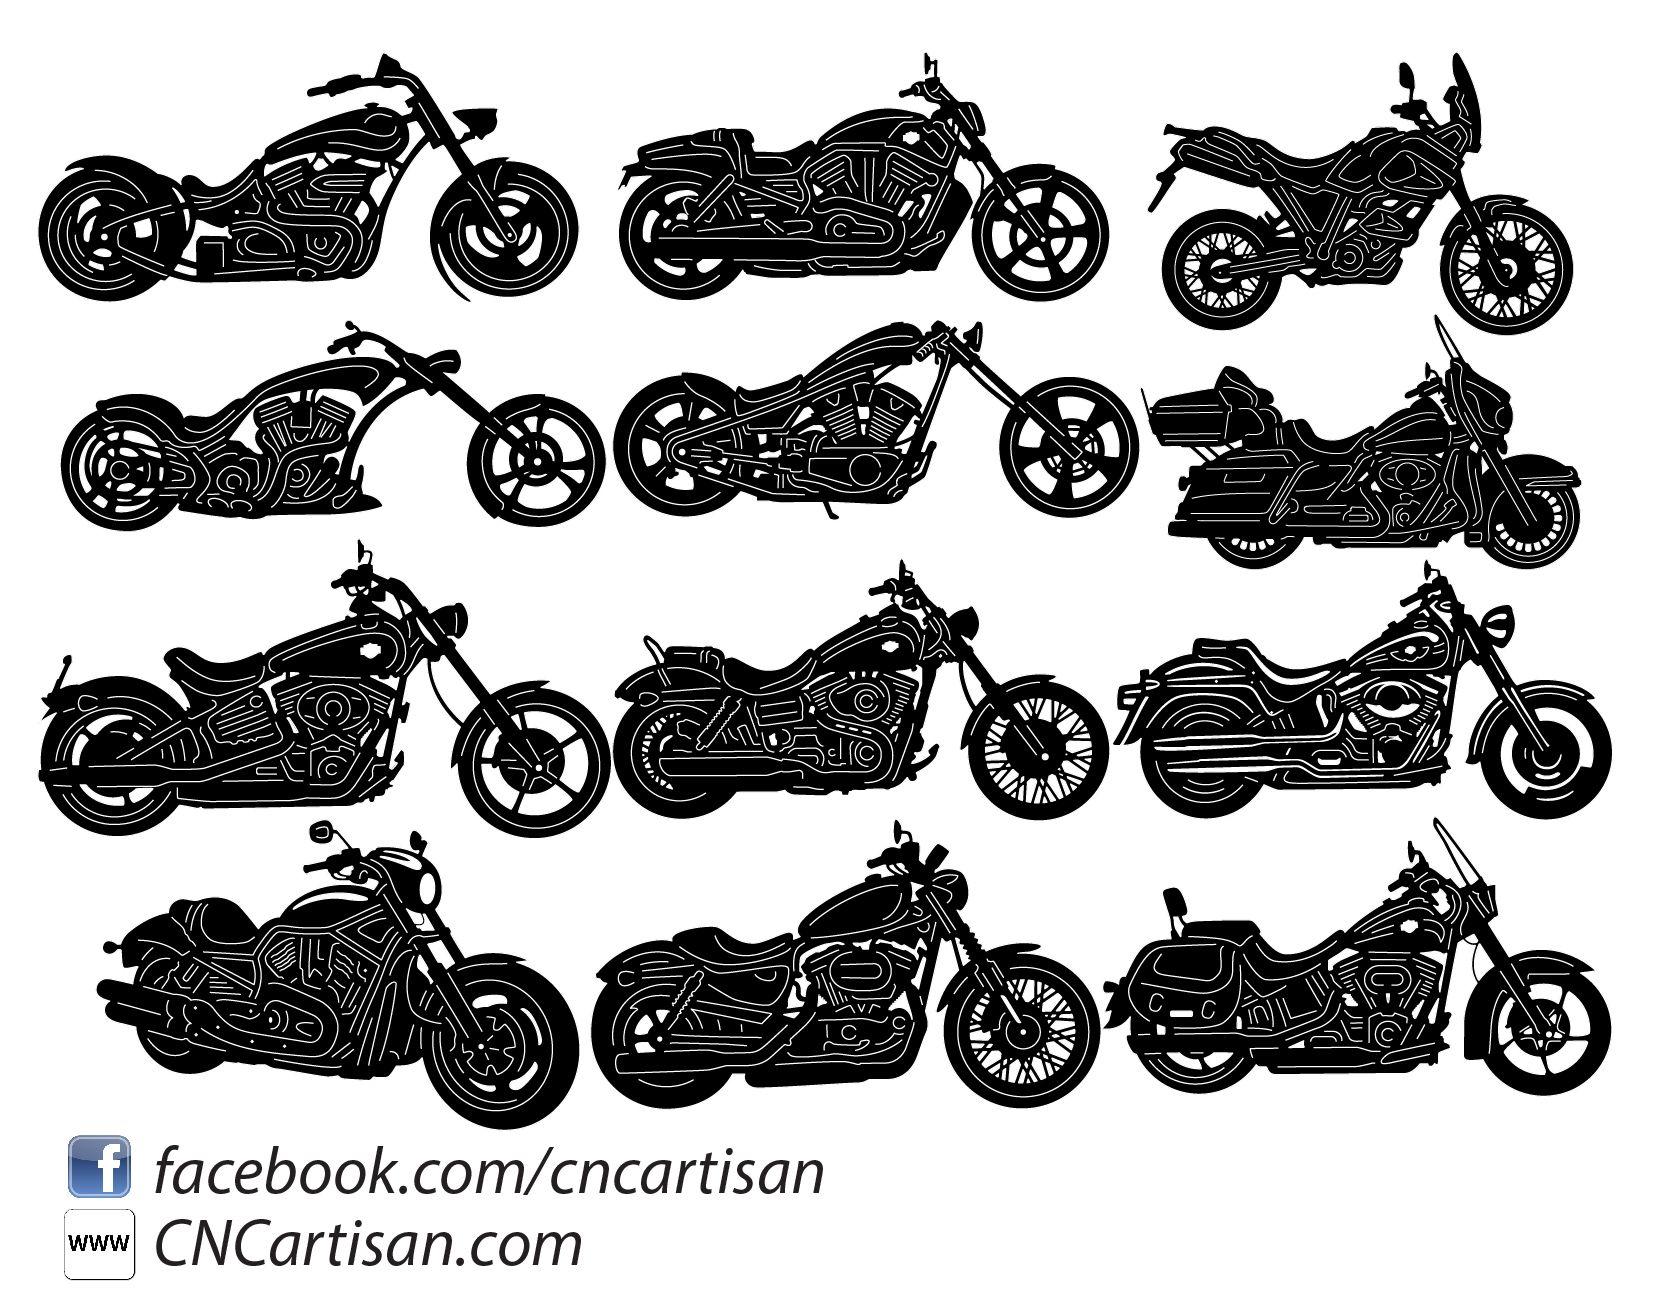 Motorcycle And Chopper Bike Dxfforcnc